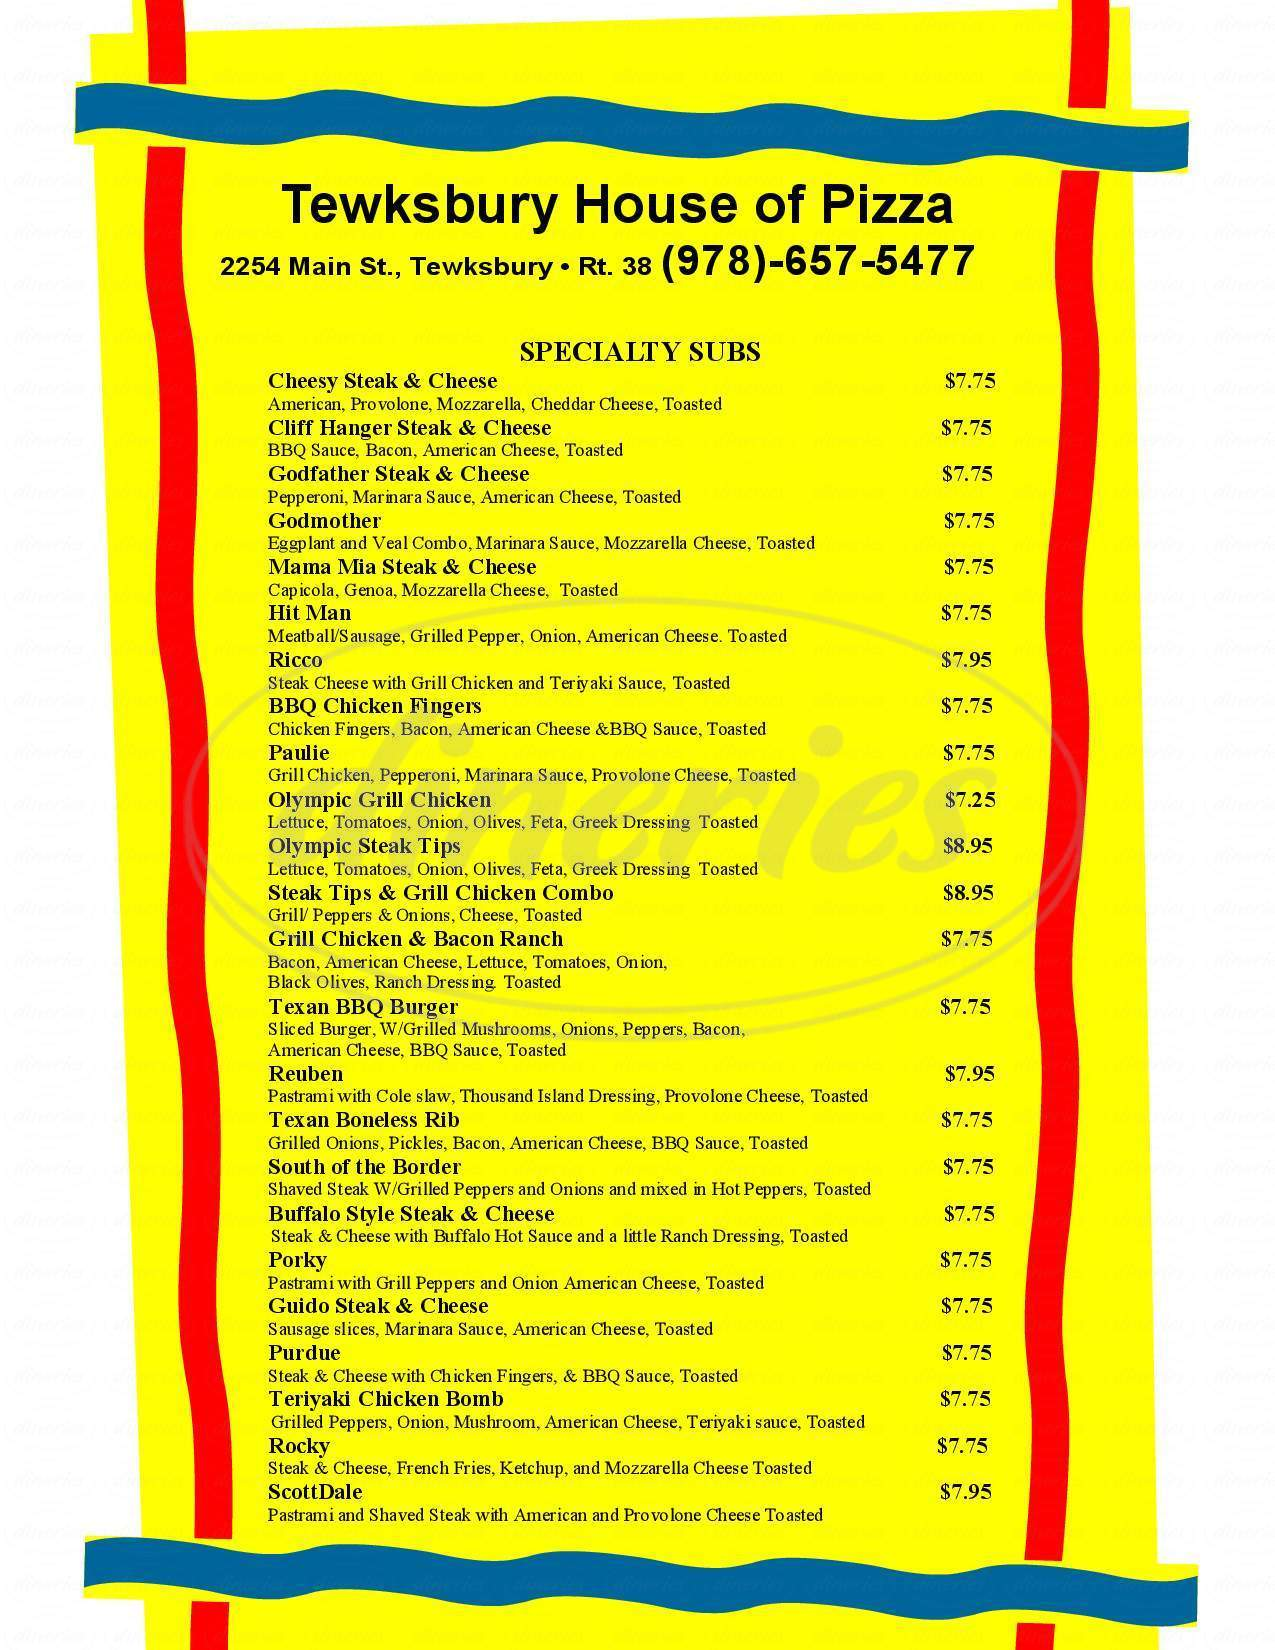 menu for Tewksbury House of Pizza